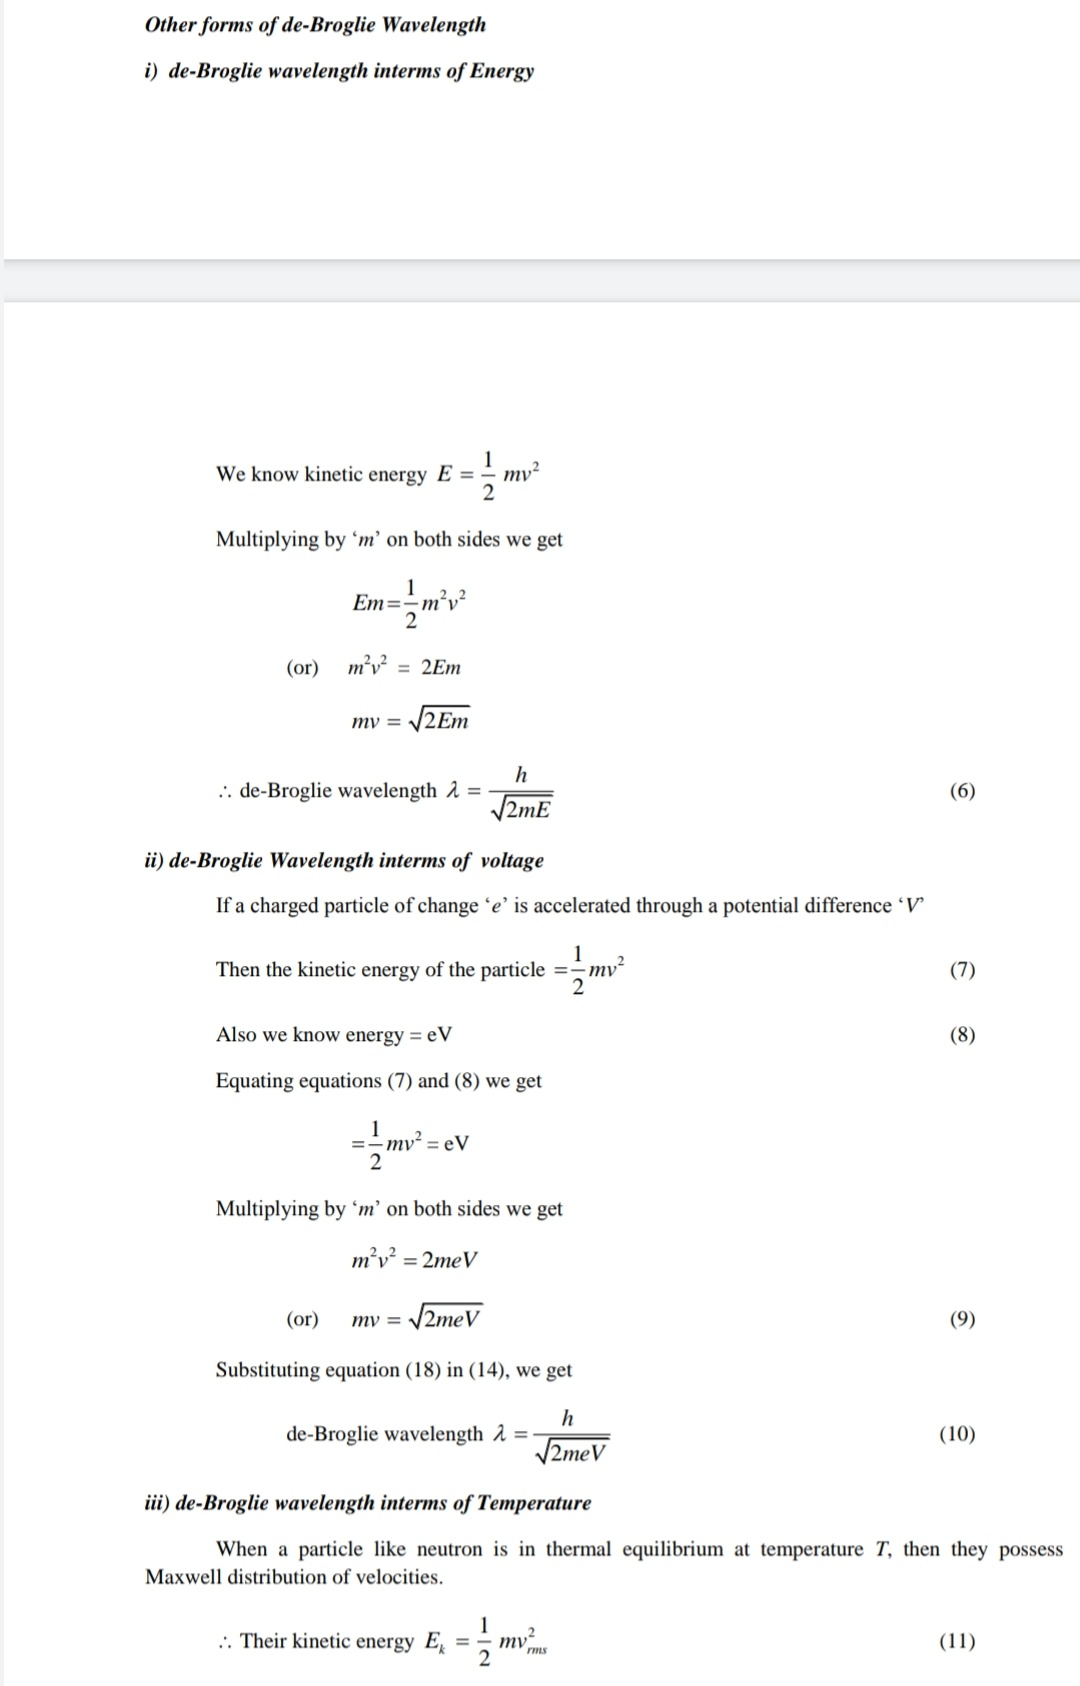 Different forms of De - Broglie  wavelength-IMG_20191022_161938.jpg